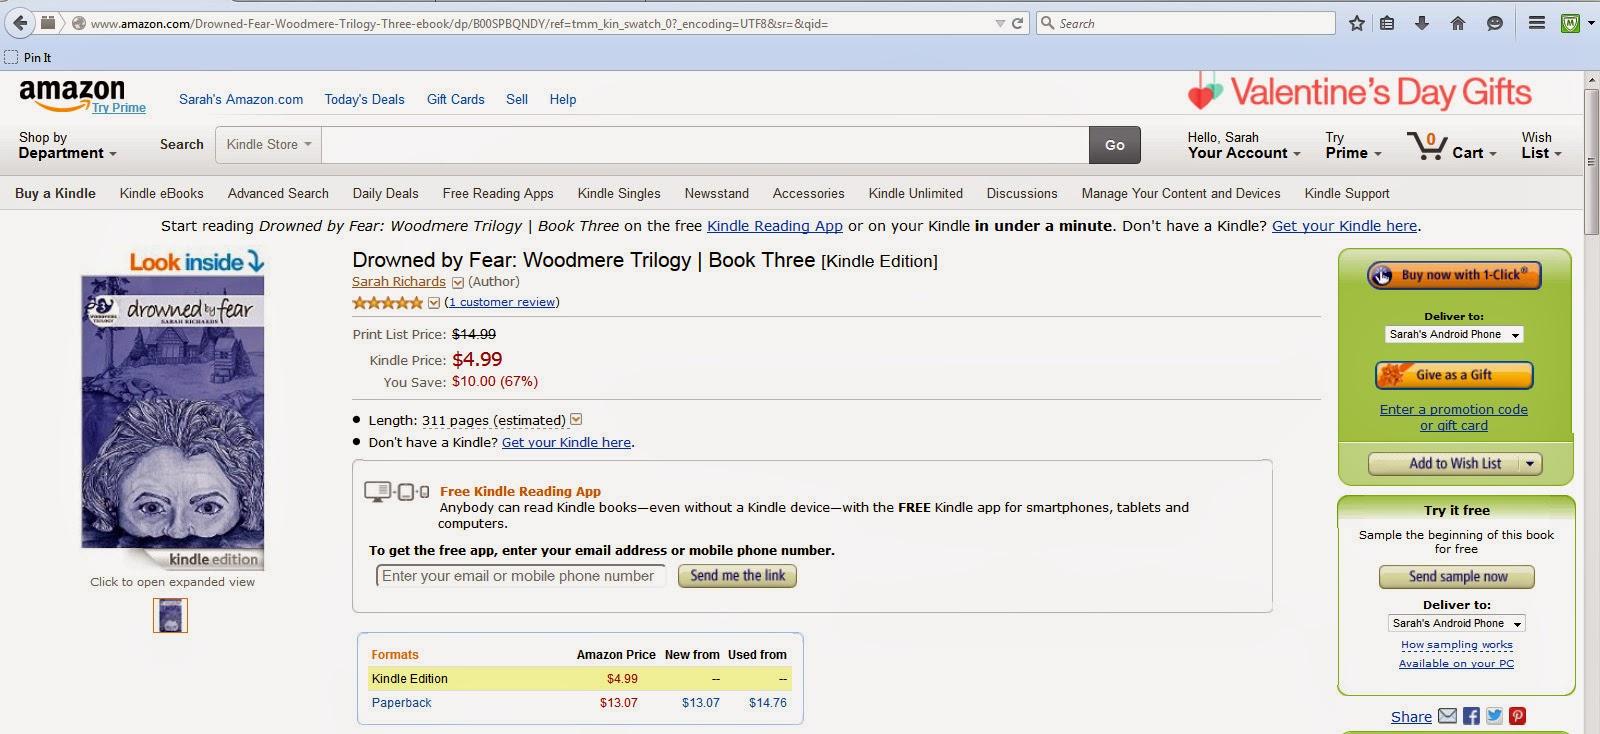 http://www.amazon.com/Drowned-Fear-Woodmere-Trilogy-Three-ebook/dp/B00SPBQNDY/ref=tmm_kin_swatch_0?_encoding=UTF8&sr=&qid=